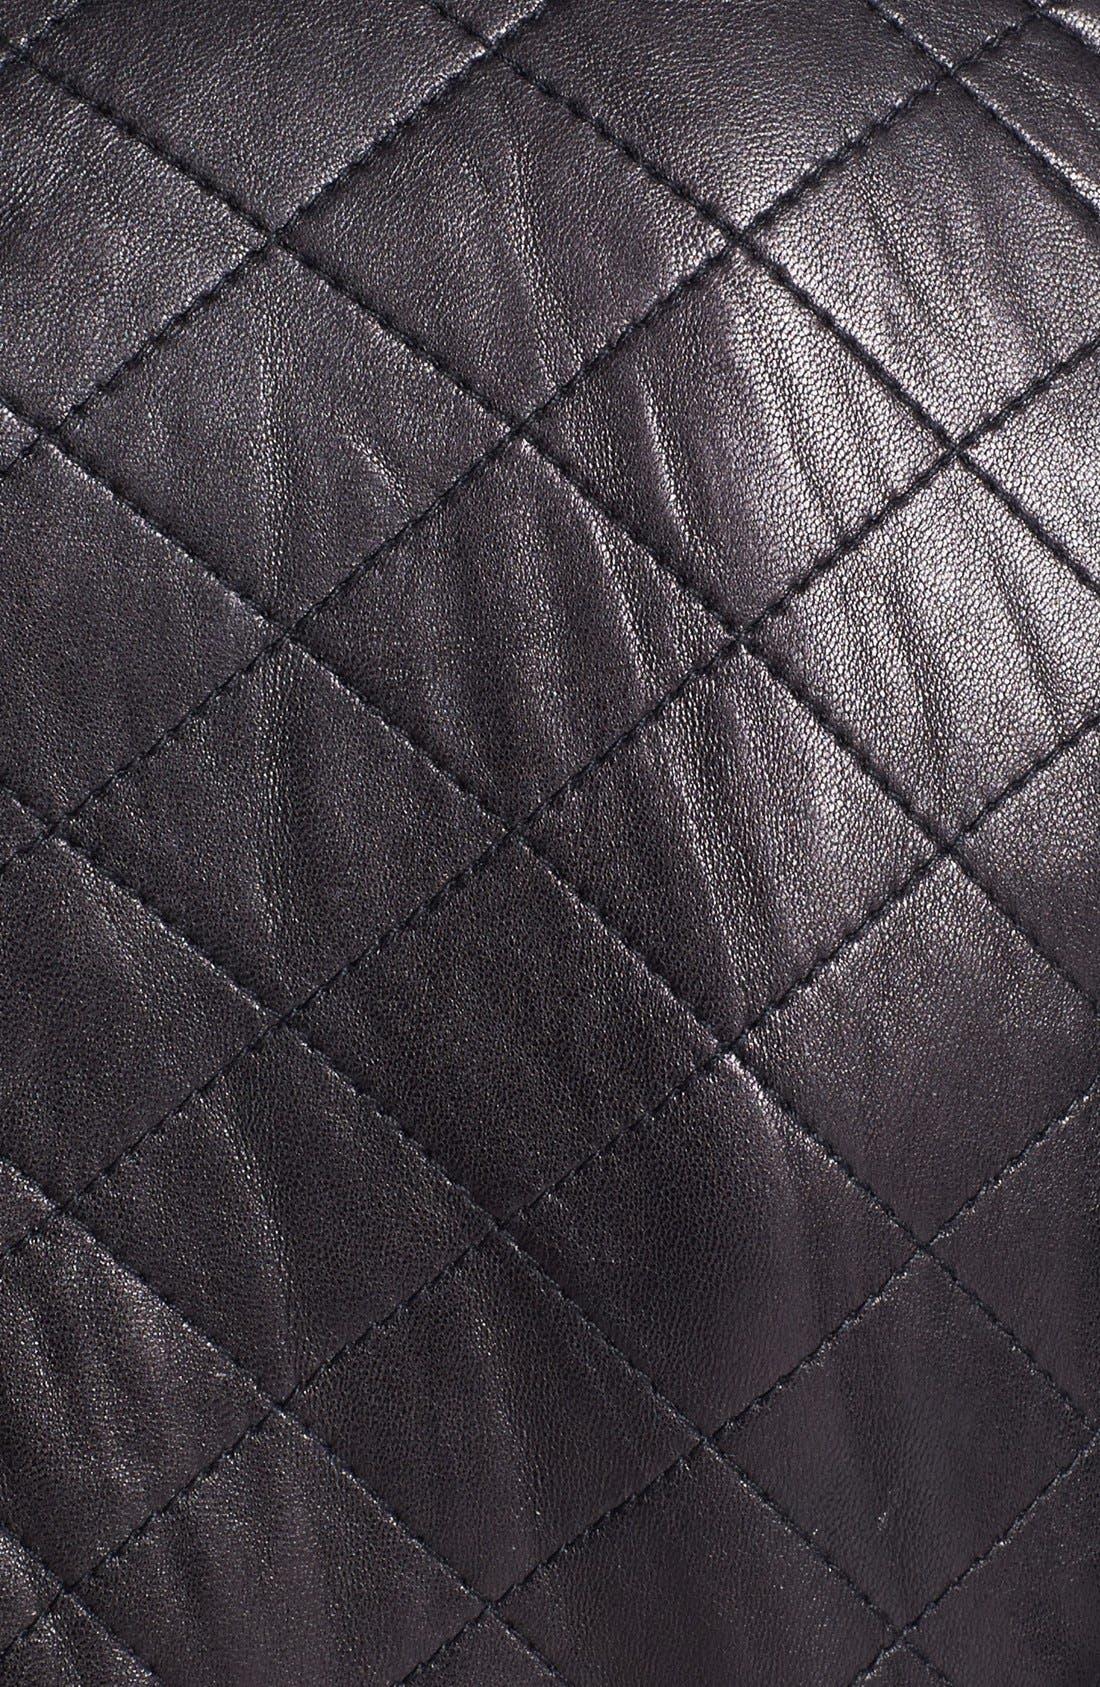 Shoulder Trim Quilted Leather Jacket,                             Alternate thumbnail 3, color,                             001